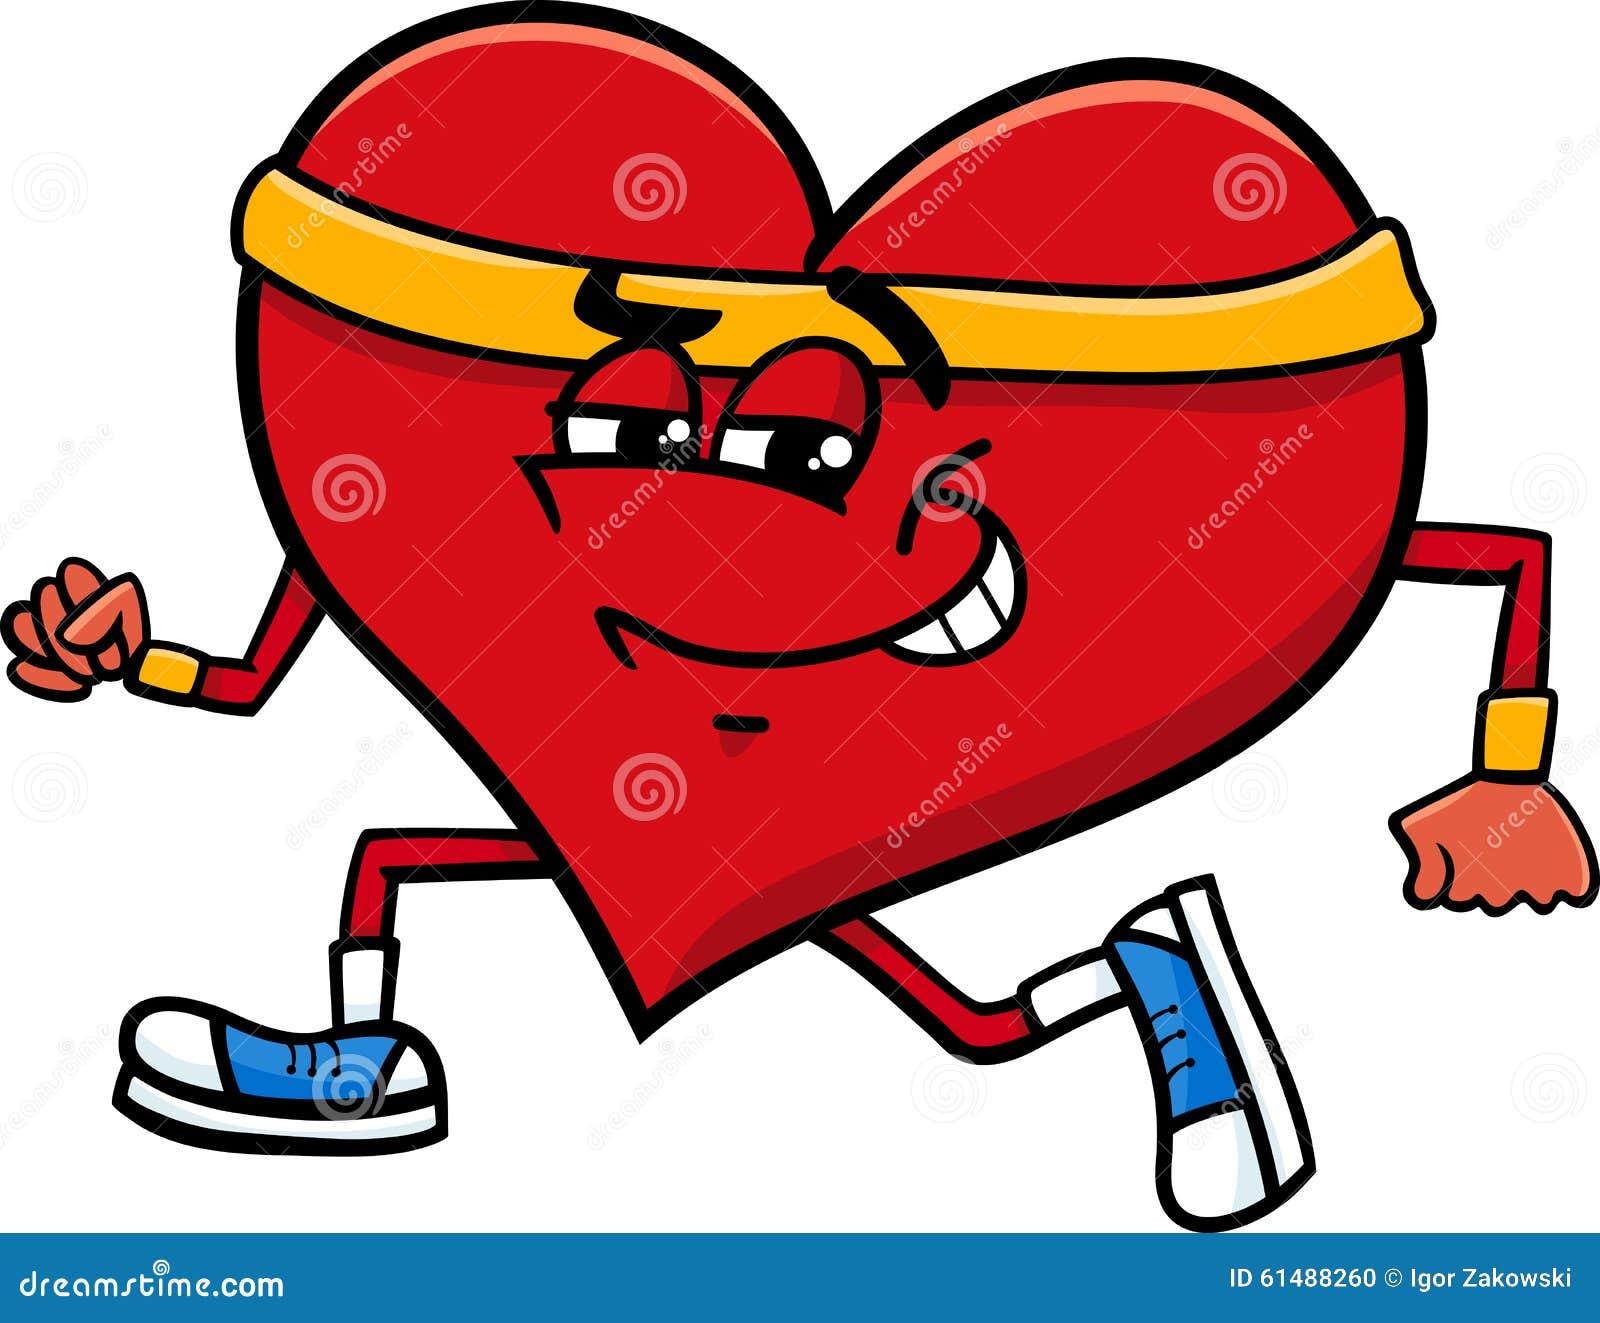 Sporty Heart Cartoon Character Stock Vector Illustration Of